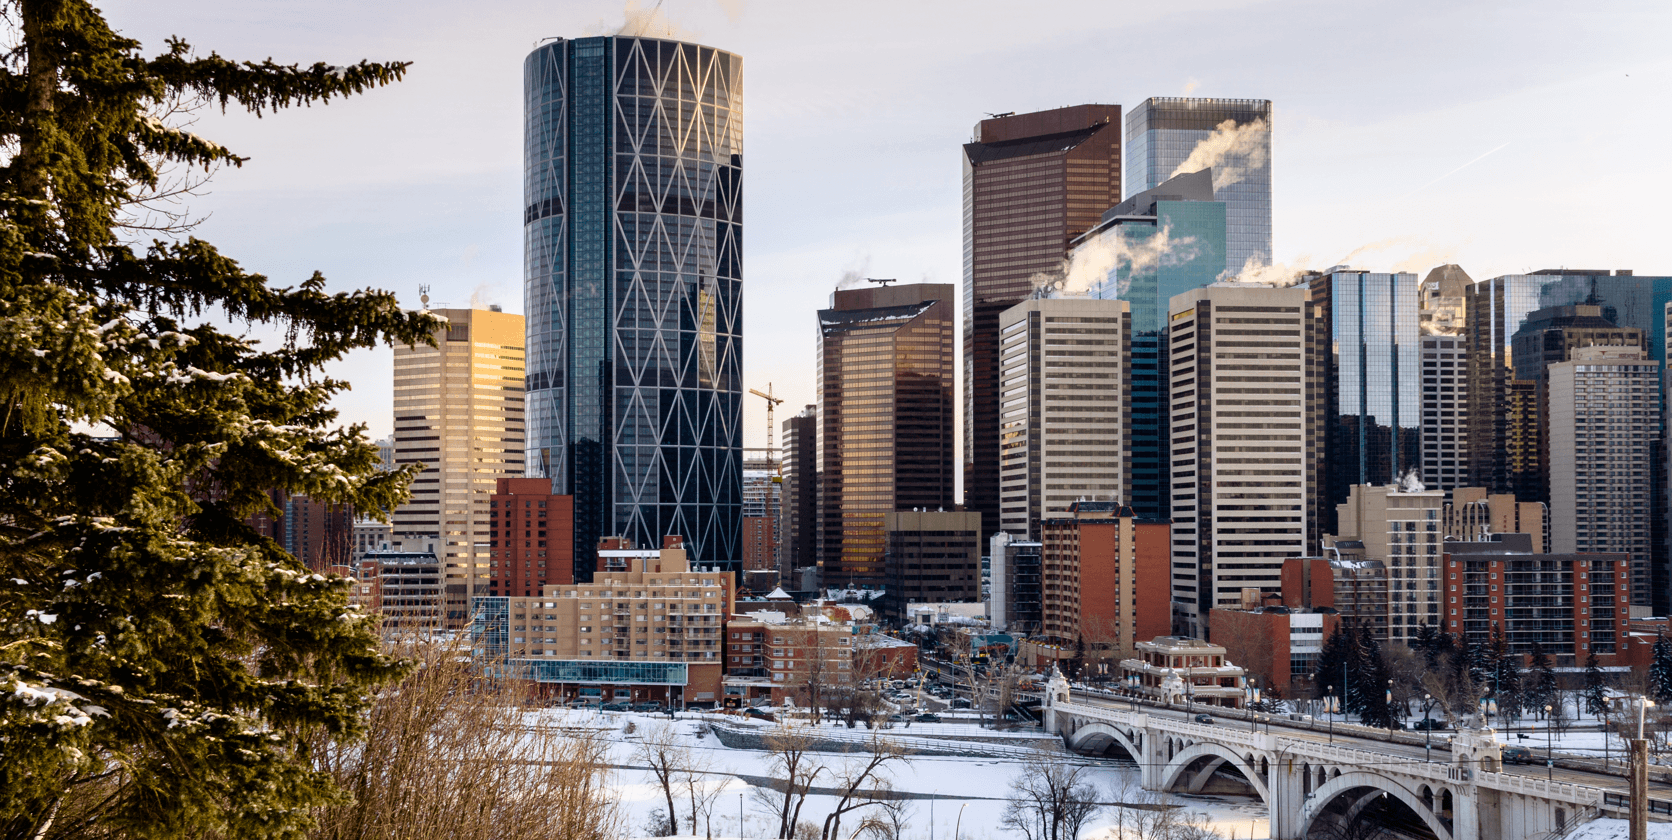 Calgary's Housing Market Forecast for 2018 Skyline Featured Image